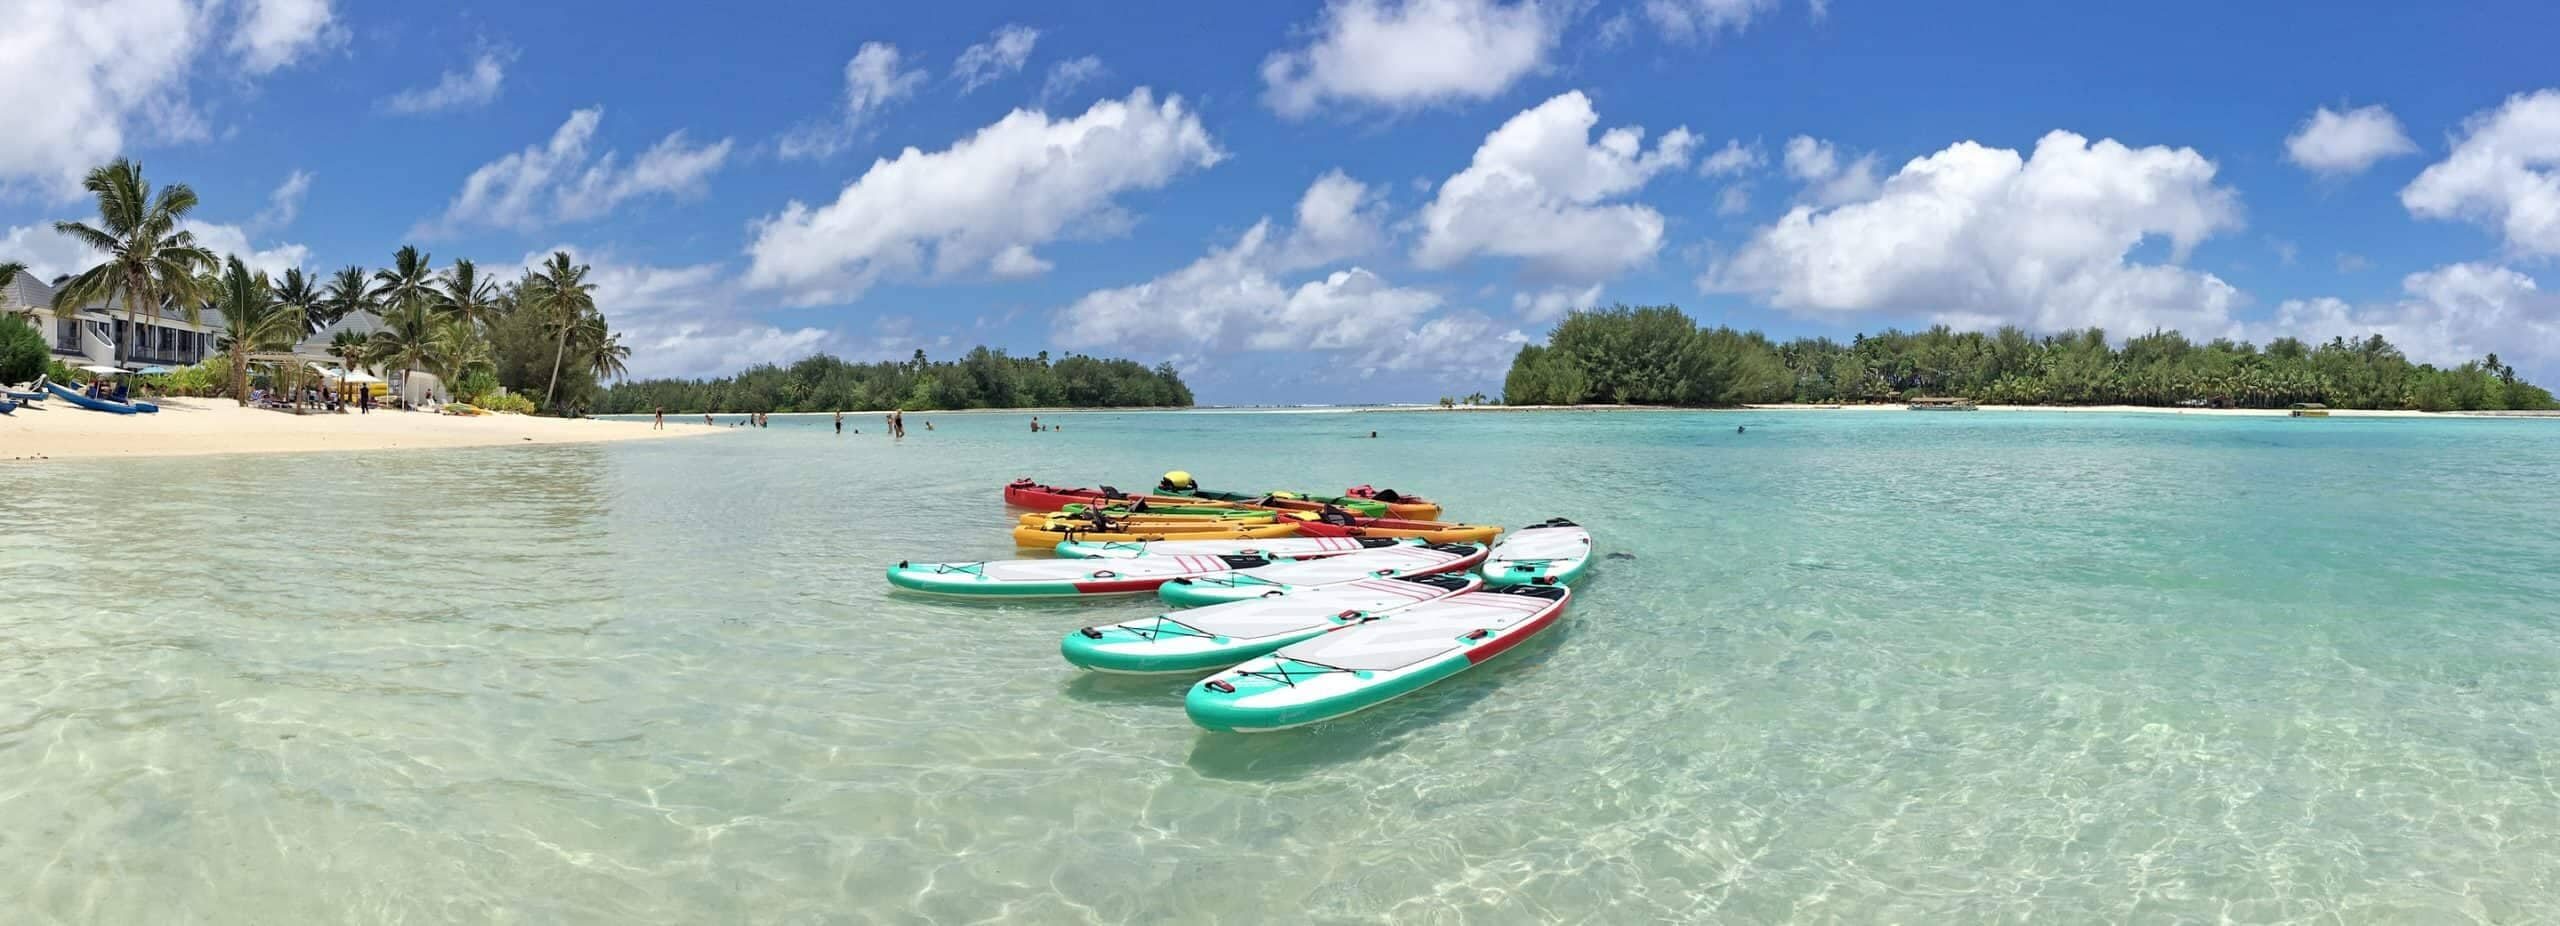 Rarotonga, Blue logoon, Cook Islands